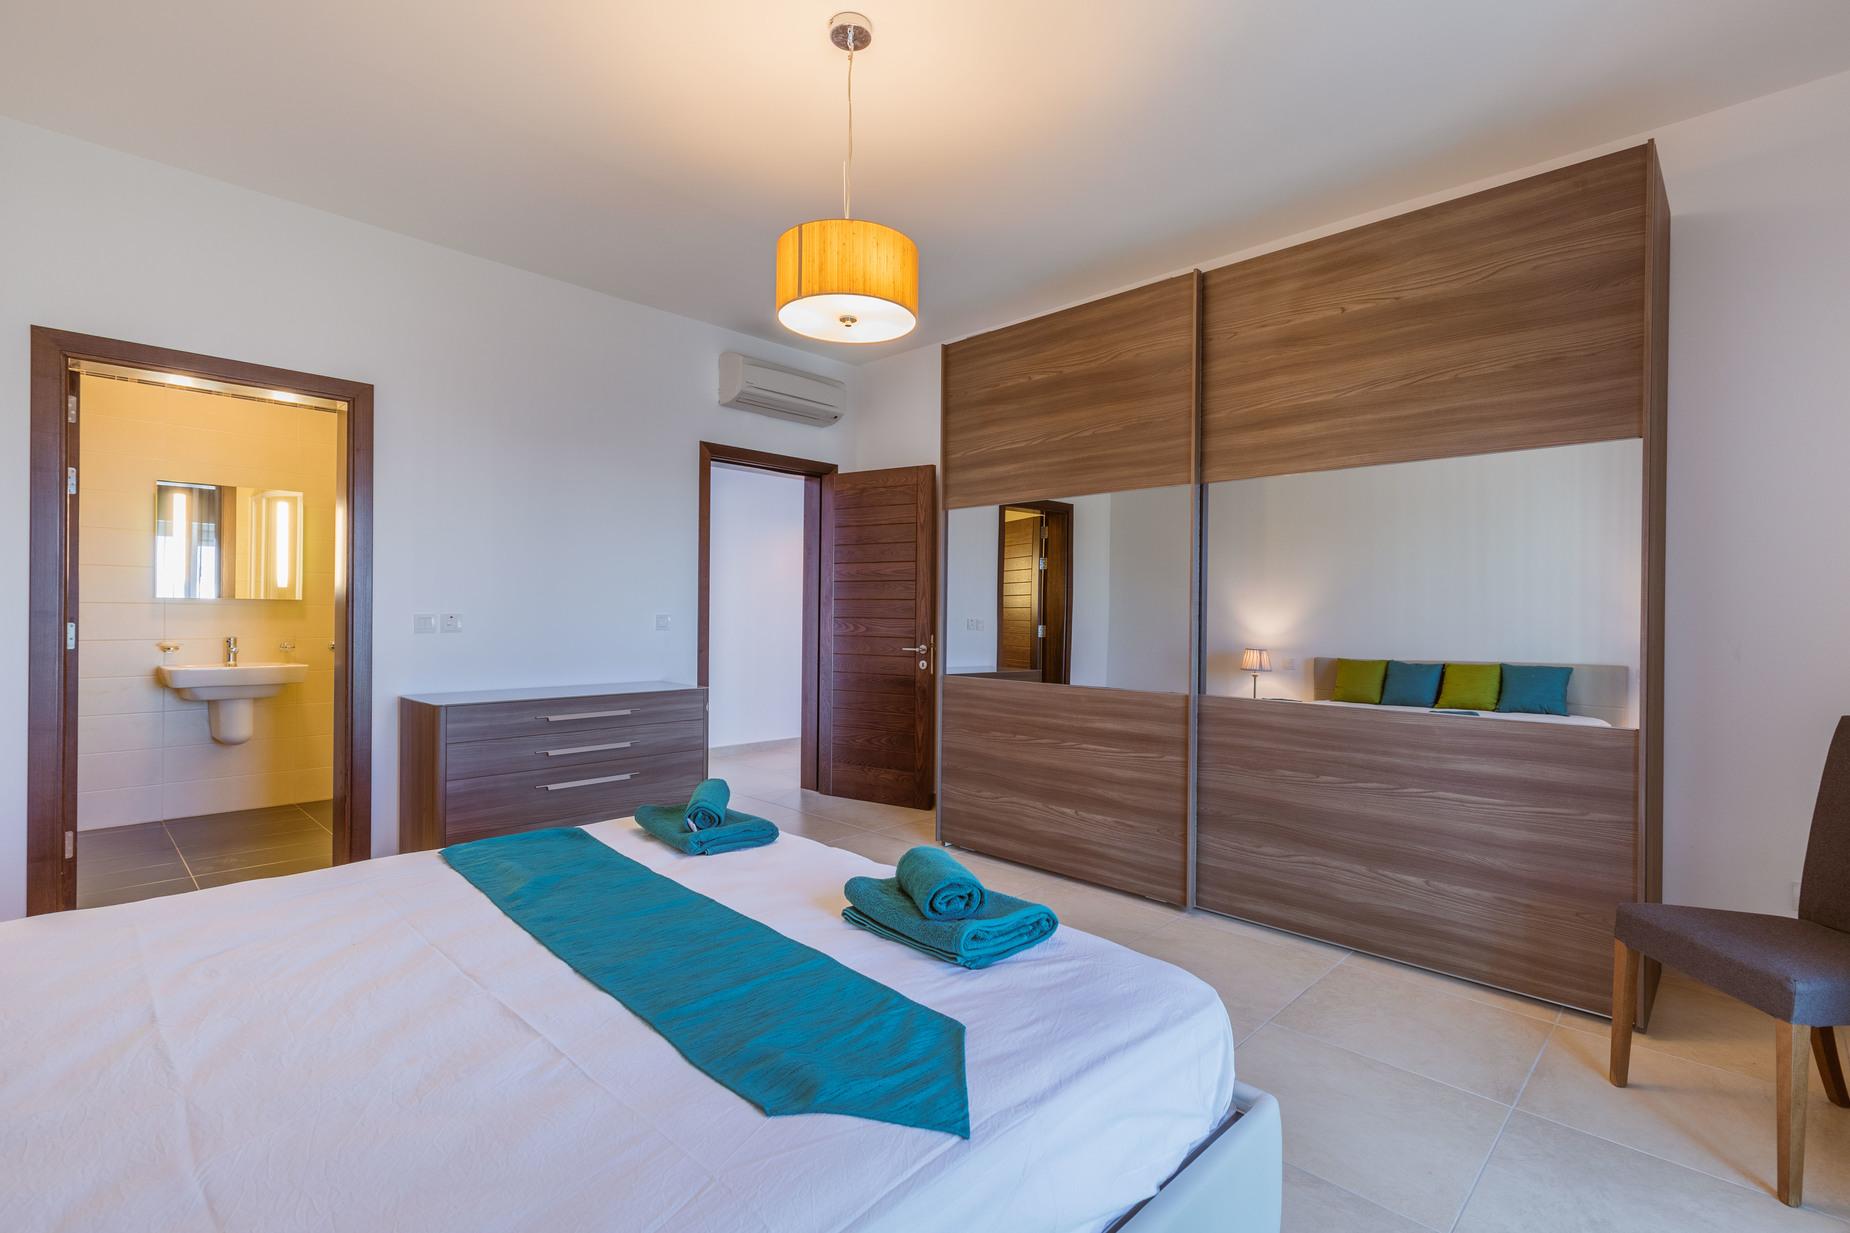 3 bed Apartment For Rent in Sliema, Sliema - thumb 12